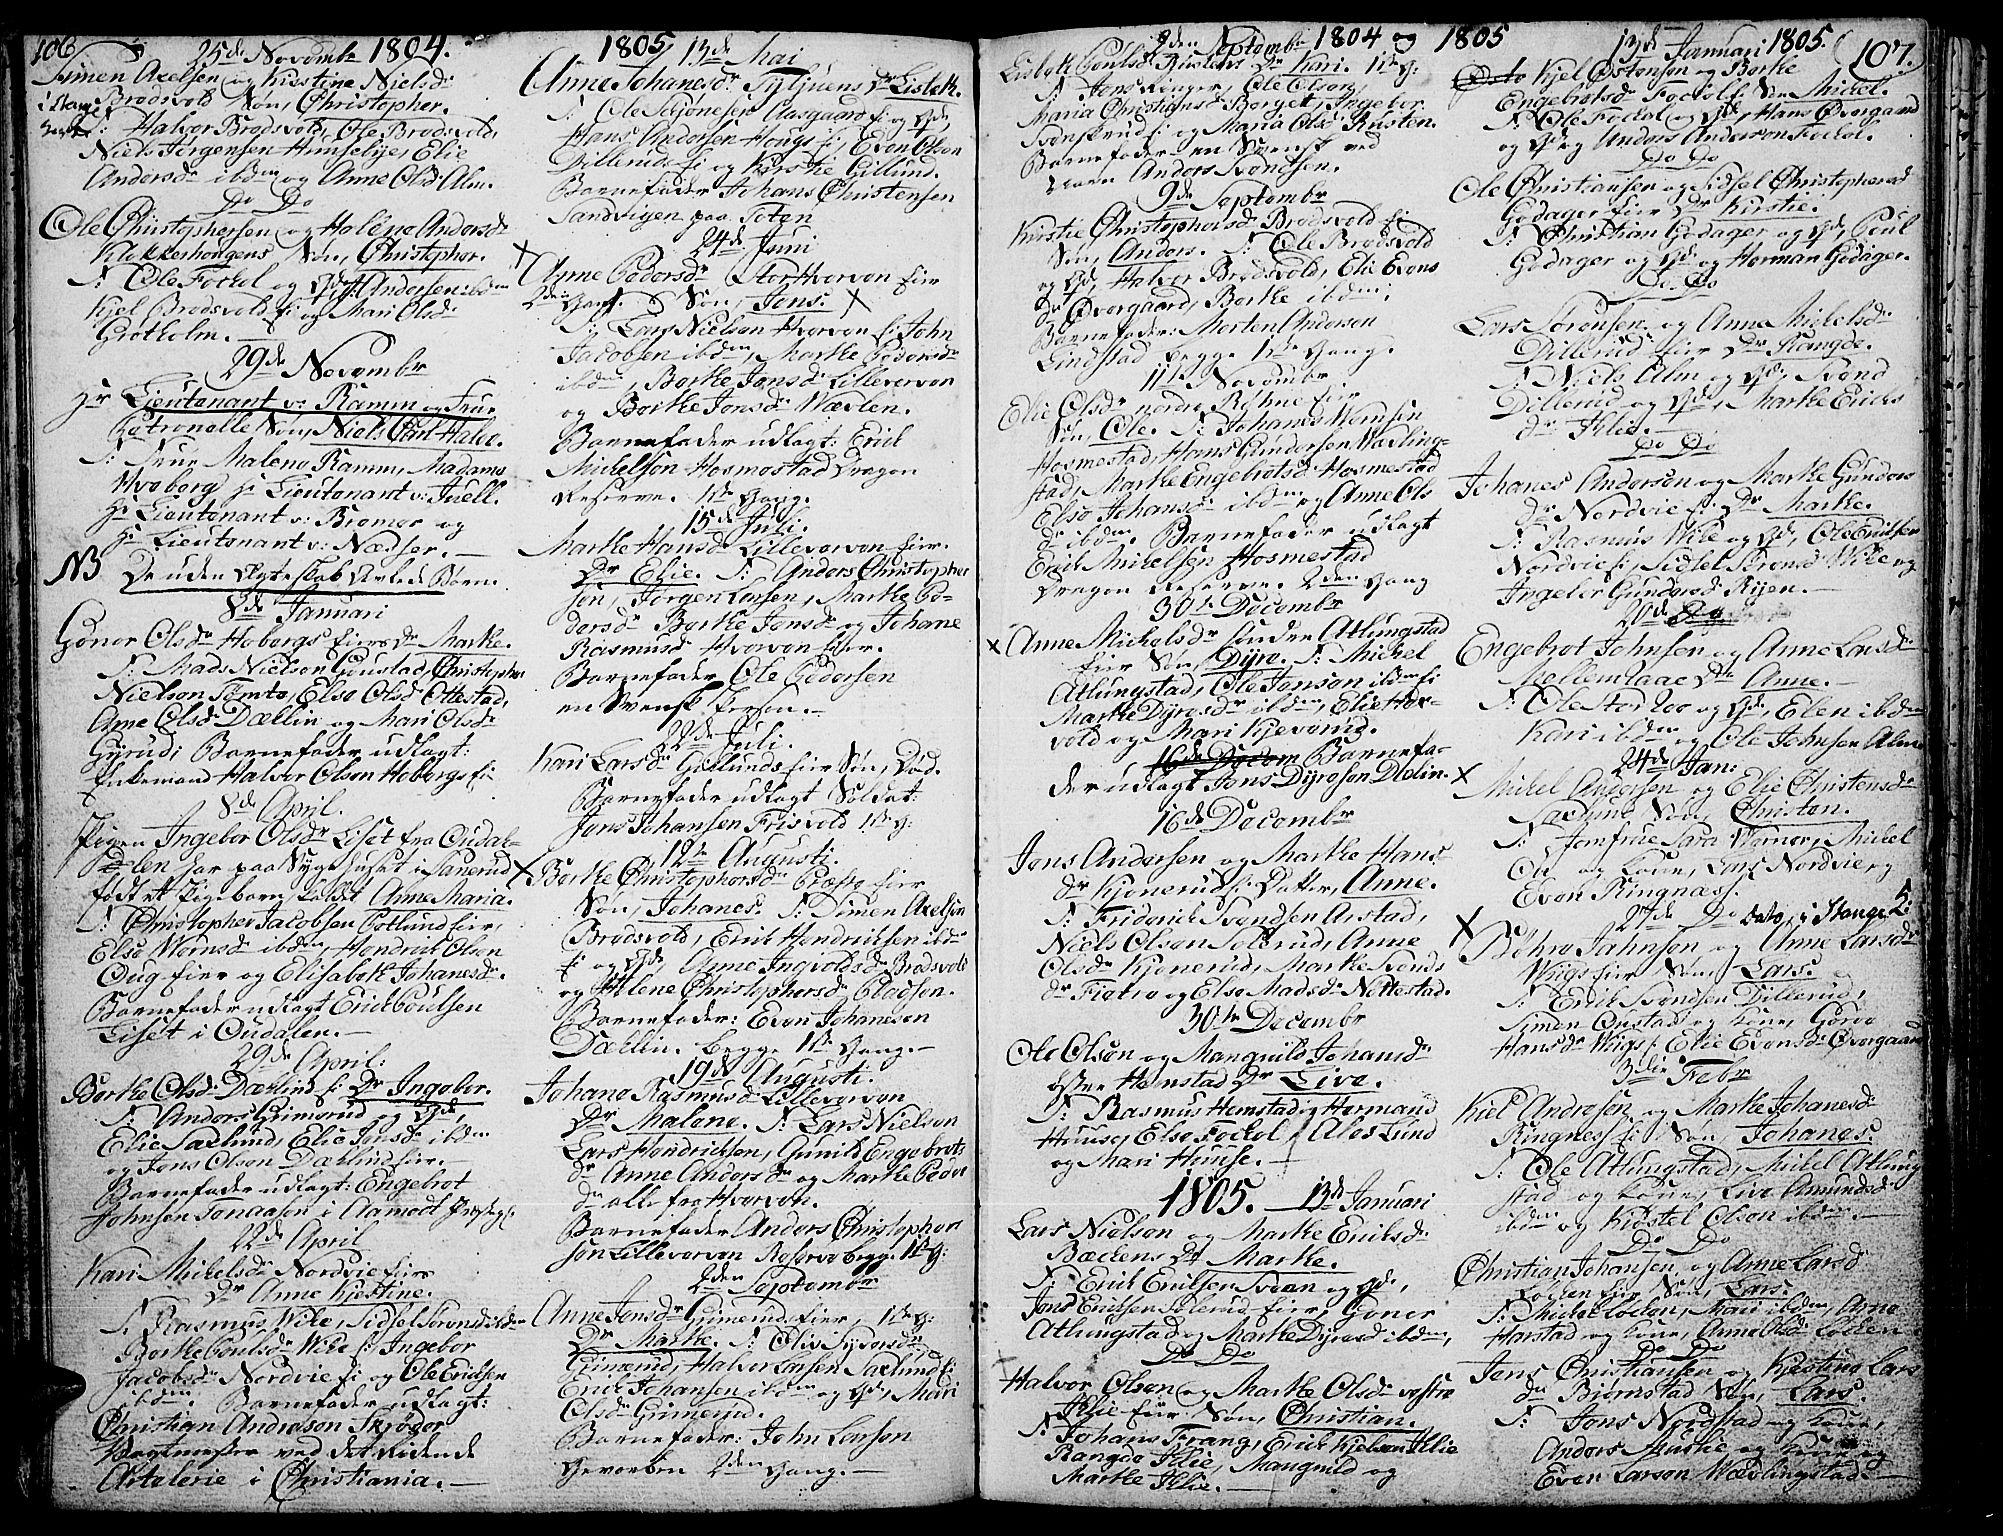 SAH, Stange prestekontor, K/L0007: Ministerialbok nr. 7, 1788-1813, s. 106-107